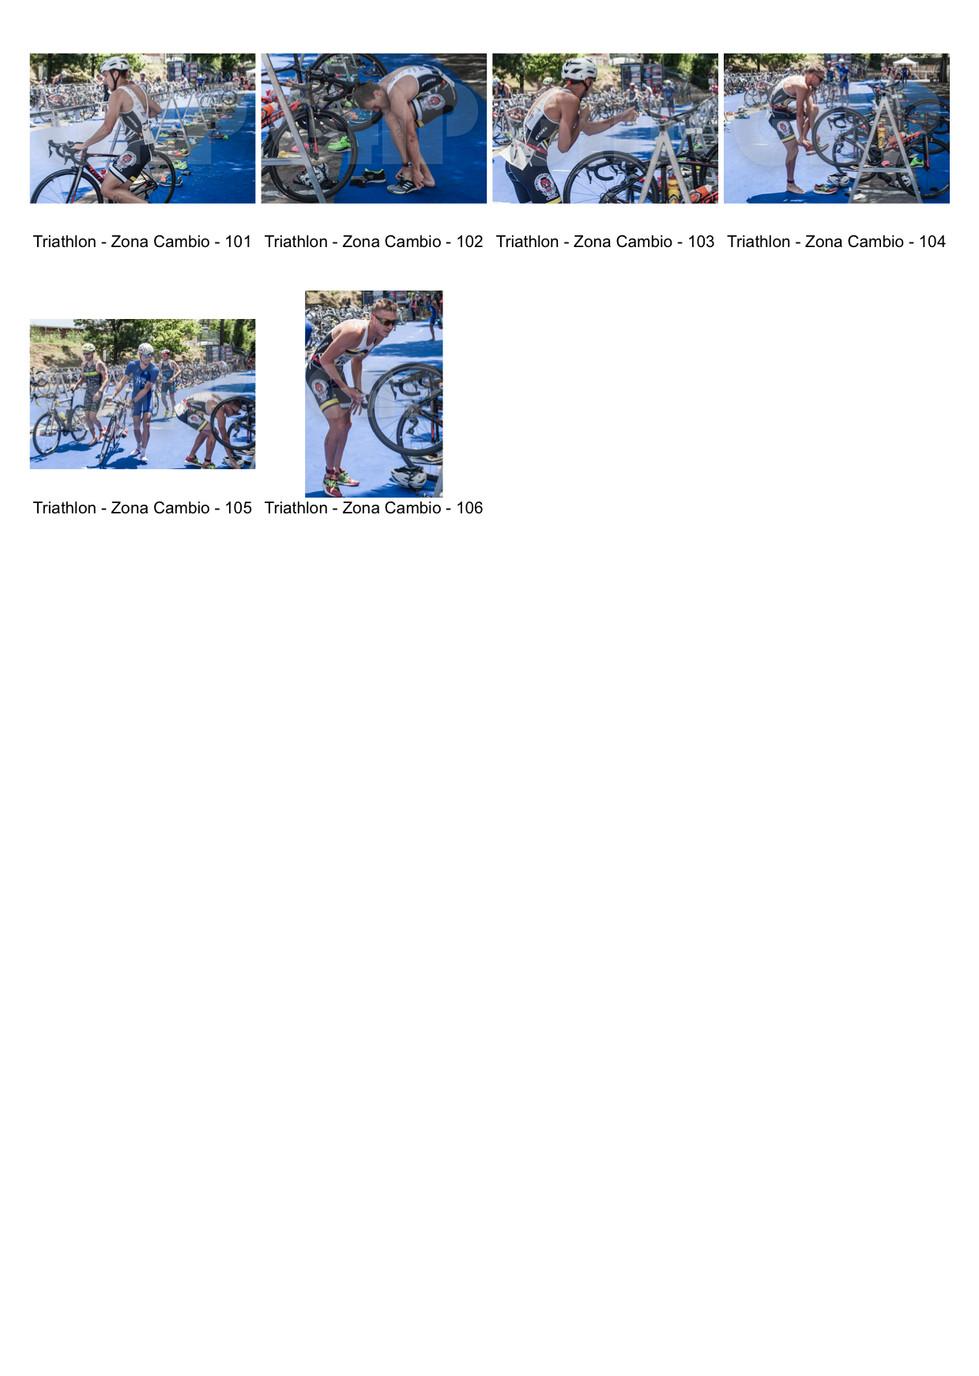 Triathlon V.Elsa - Zona Cambio-6.jpg